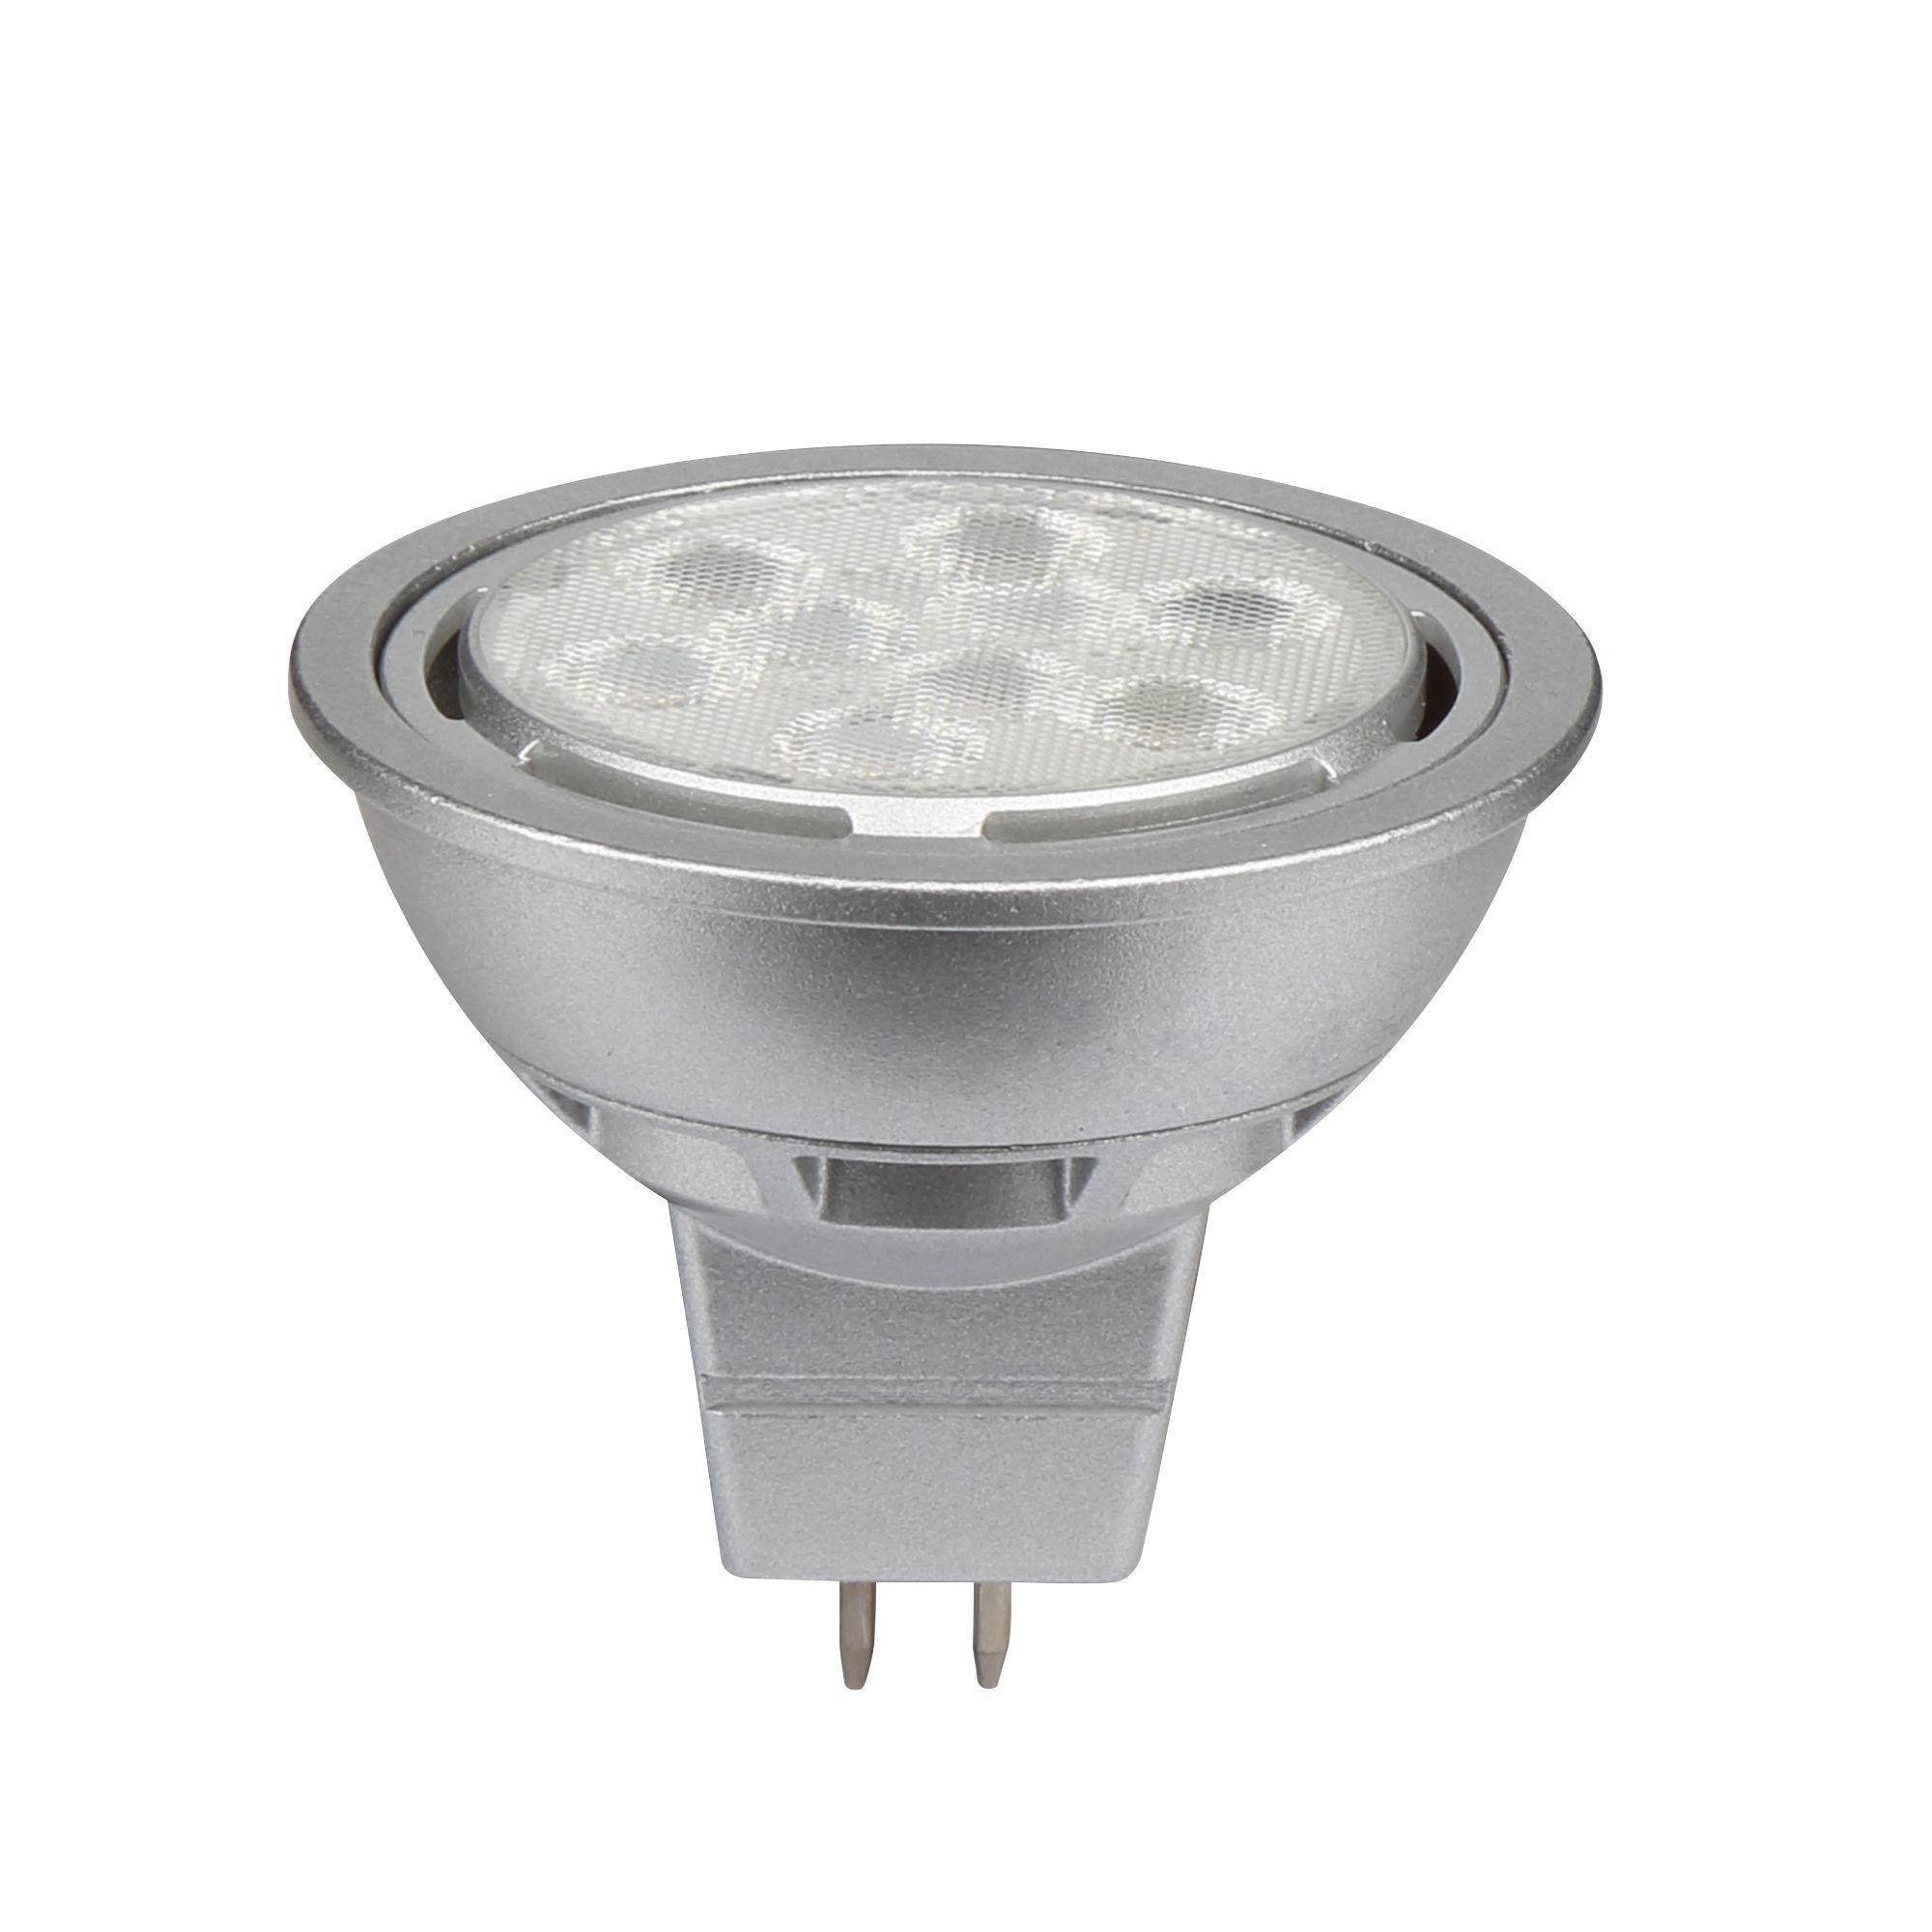 diall gu5 3 mr16 621lm led reflector light bulb departments diy at b q. Black Bedroom Furniture Sets. Home Design Ideas